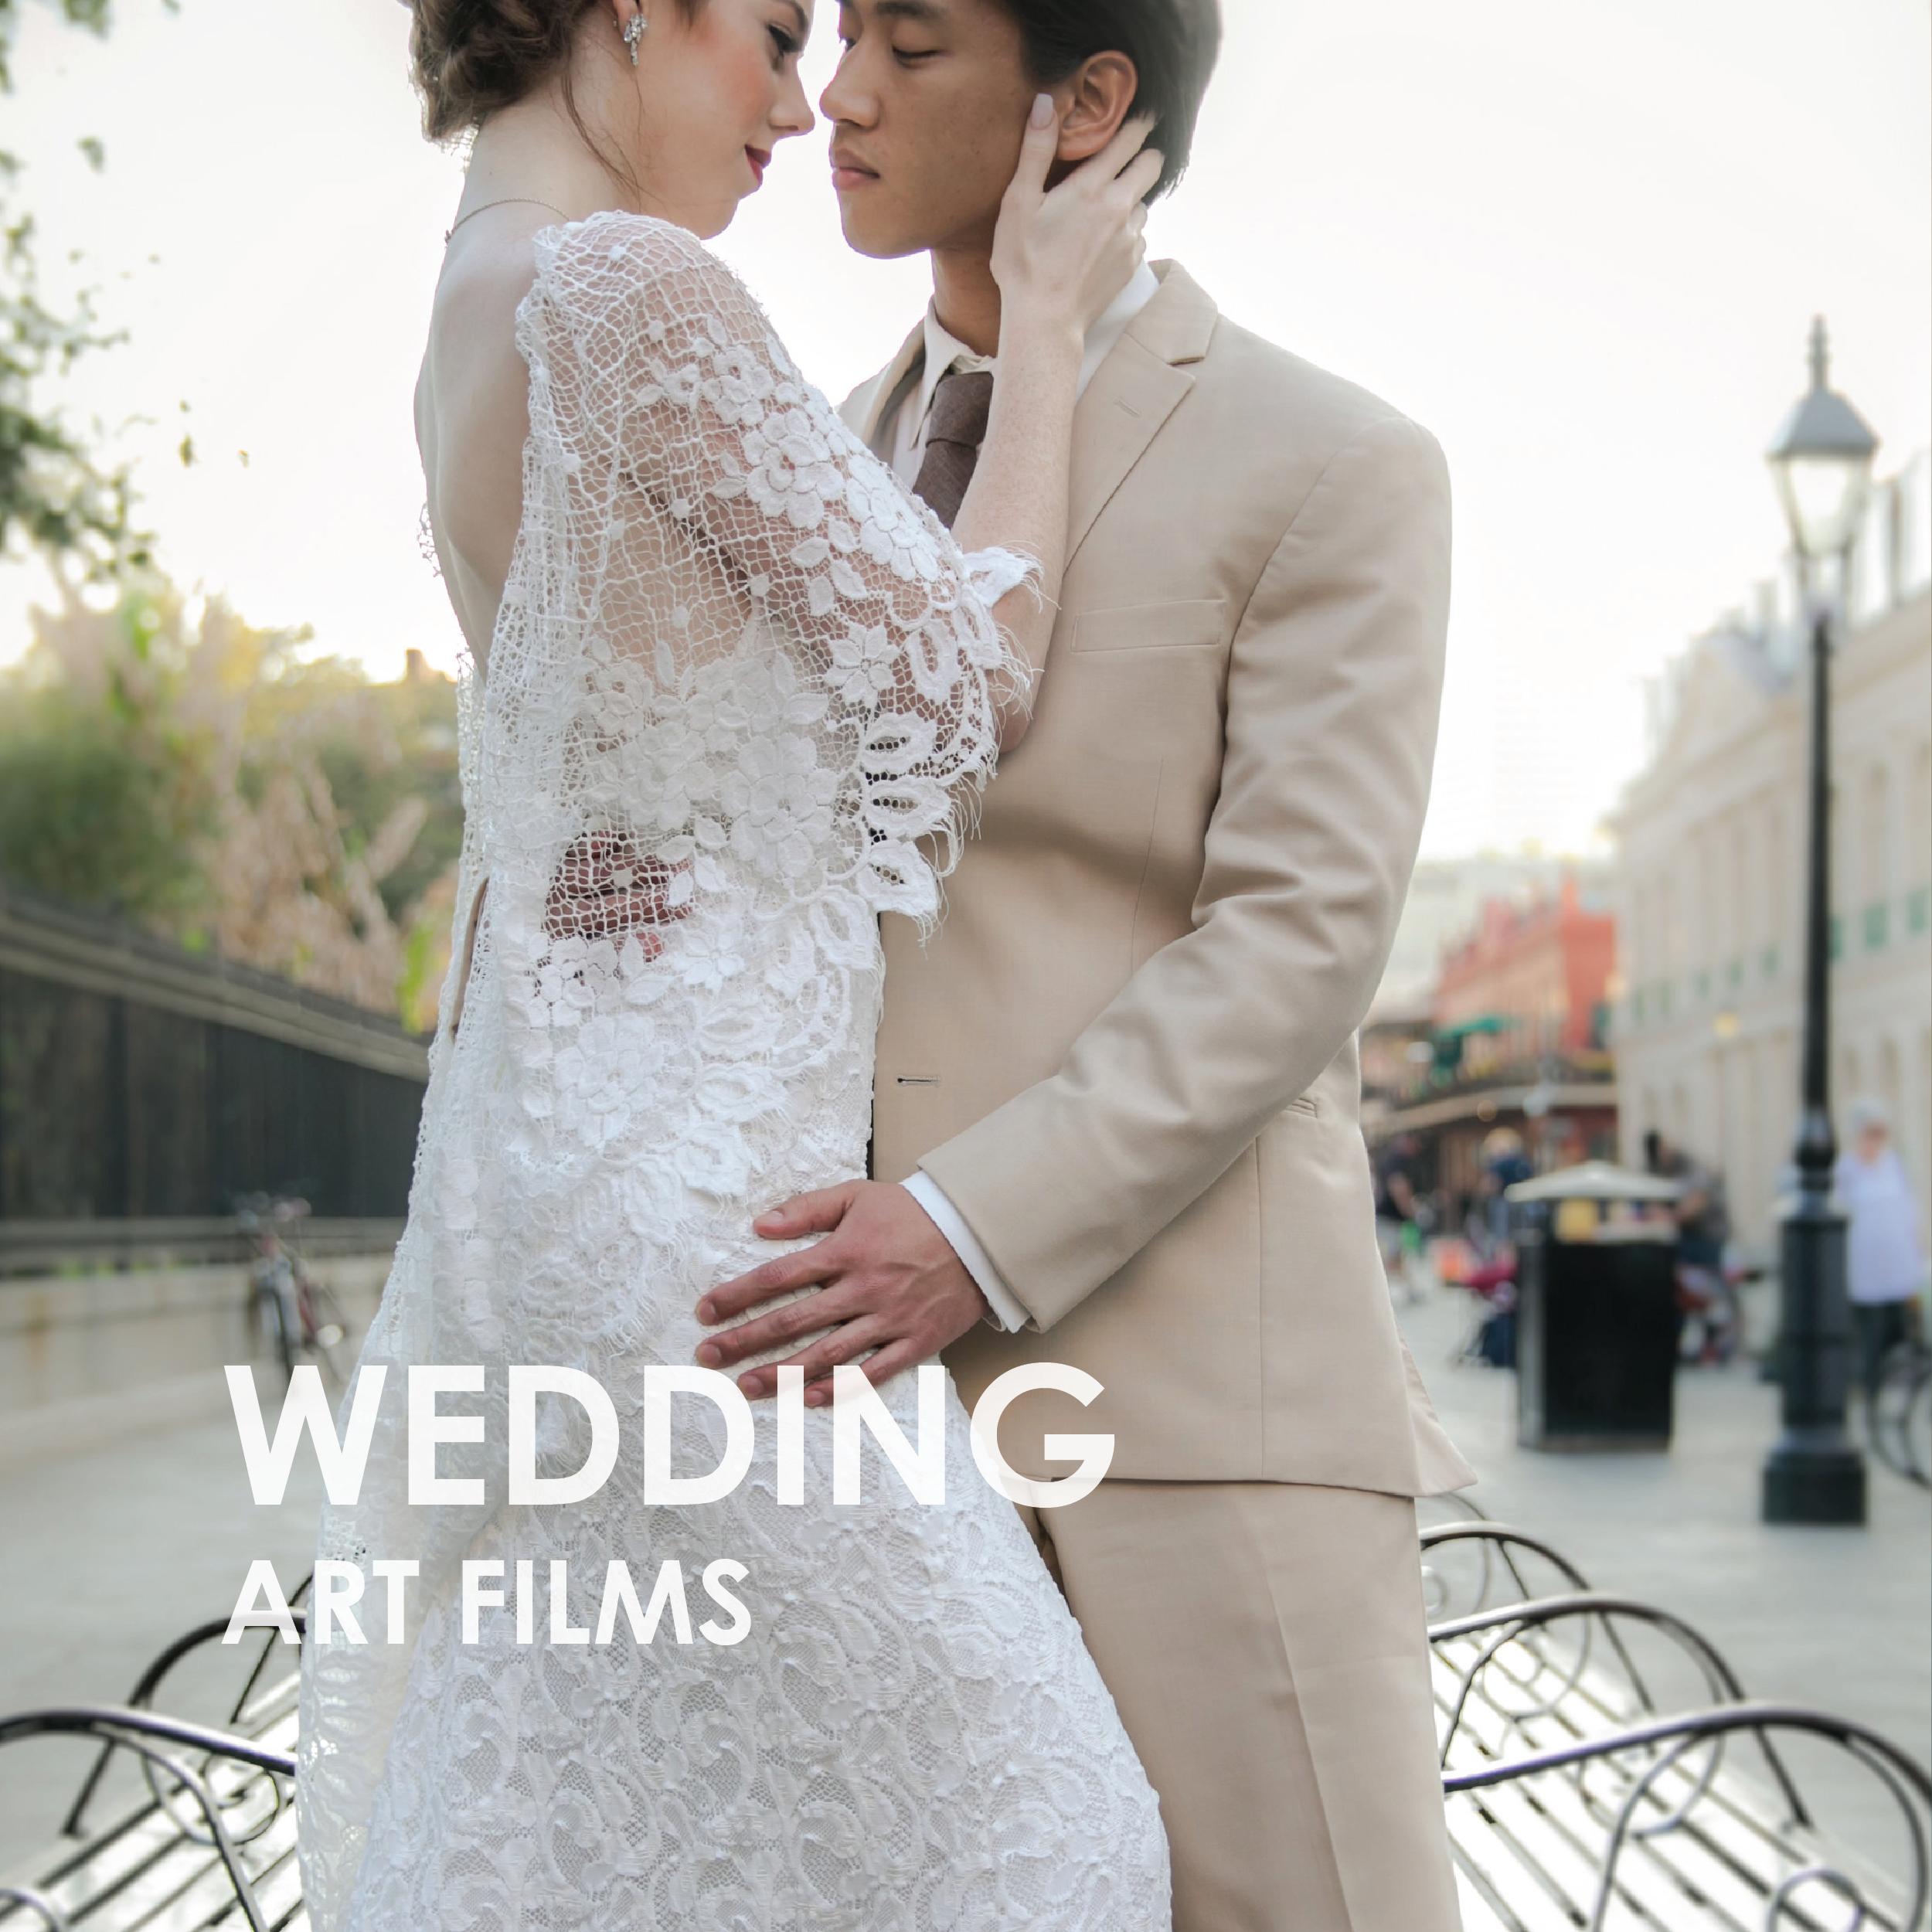 Wedding videographer memphis Brides Weddings Nashville